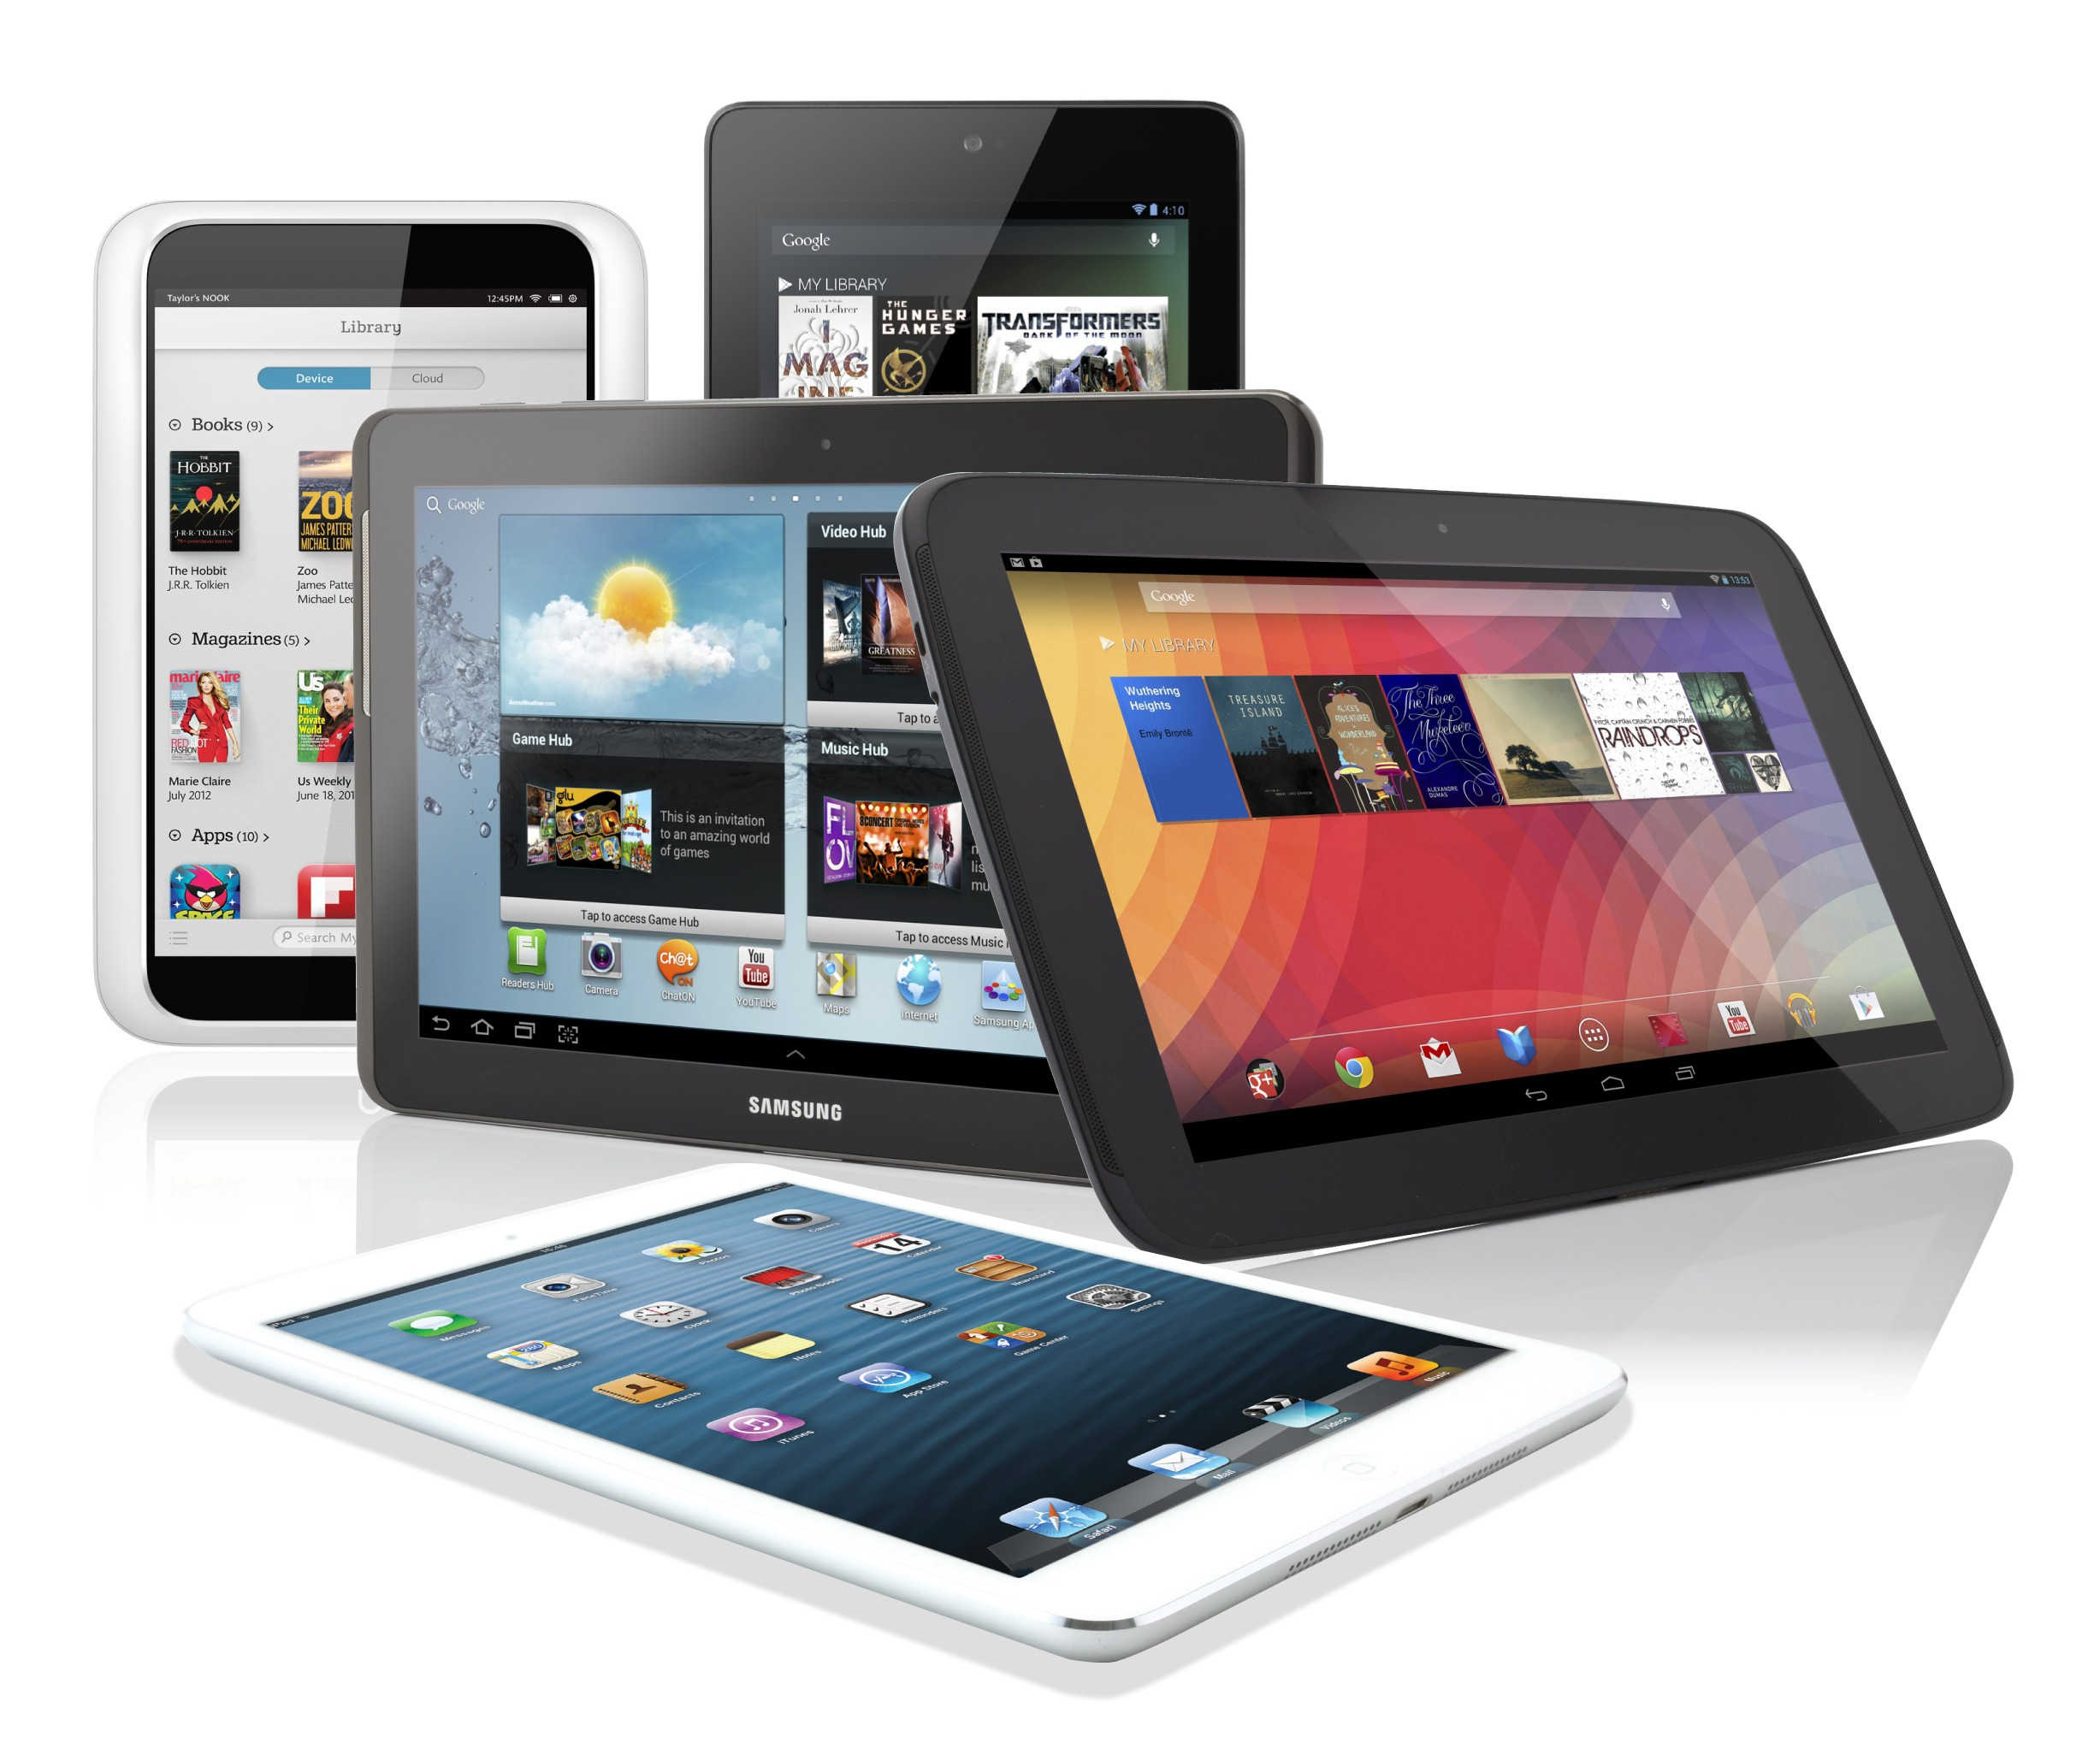 Tablet Shipments Q4 2013